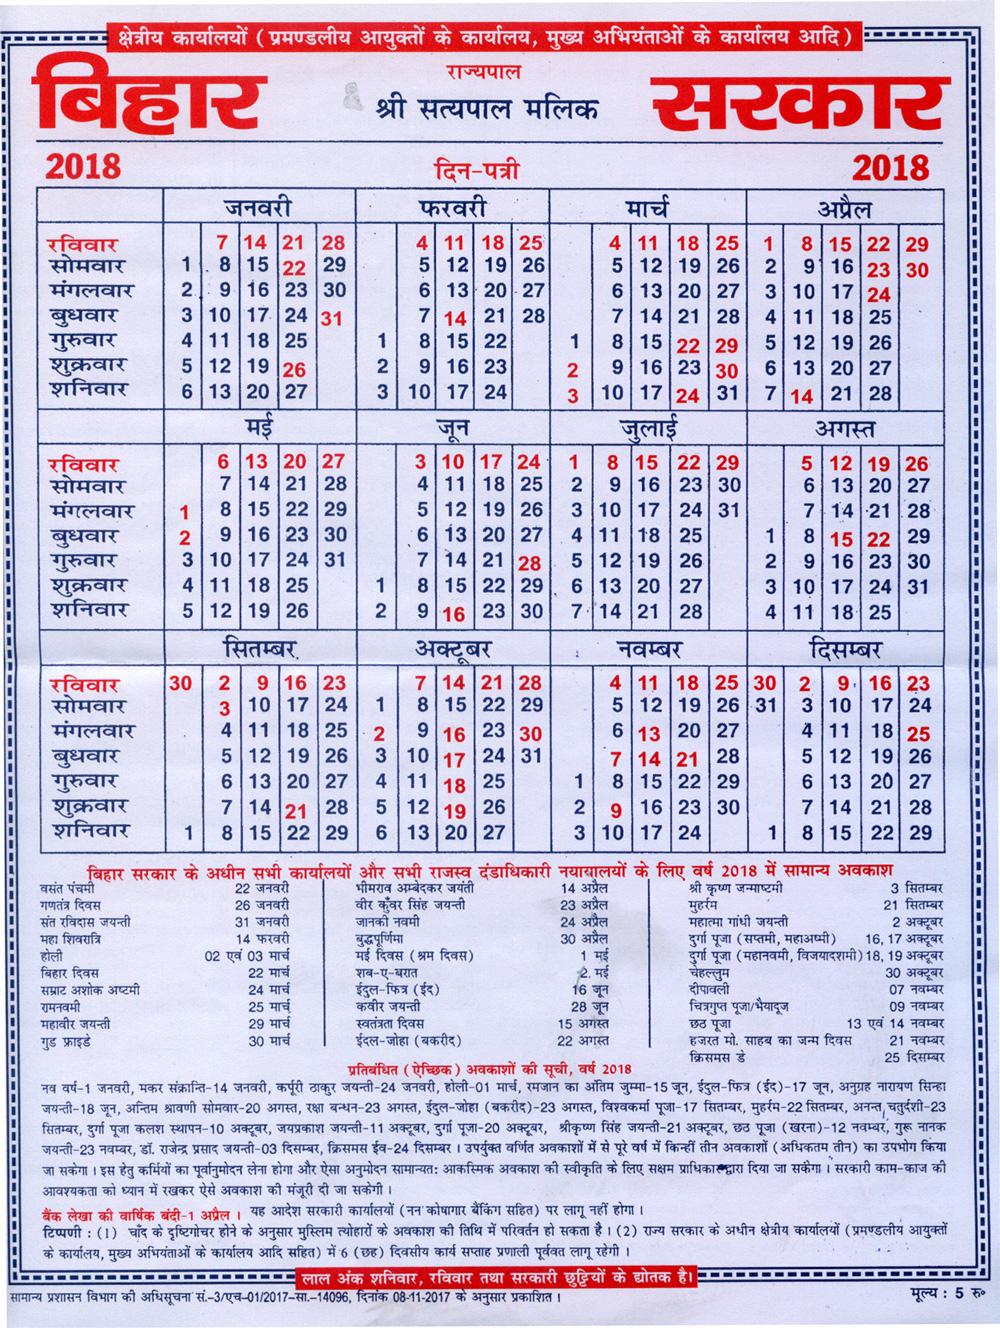 Bihar Govt. Calendar 2018, Bihar Govt. Holiday List, Holiday regarding 2020 Calendar Bihar